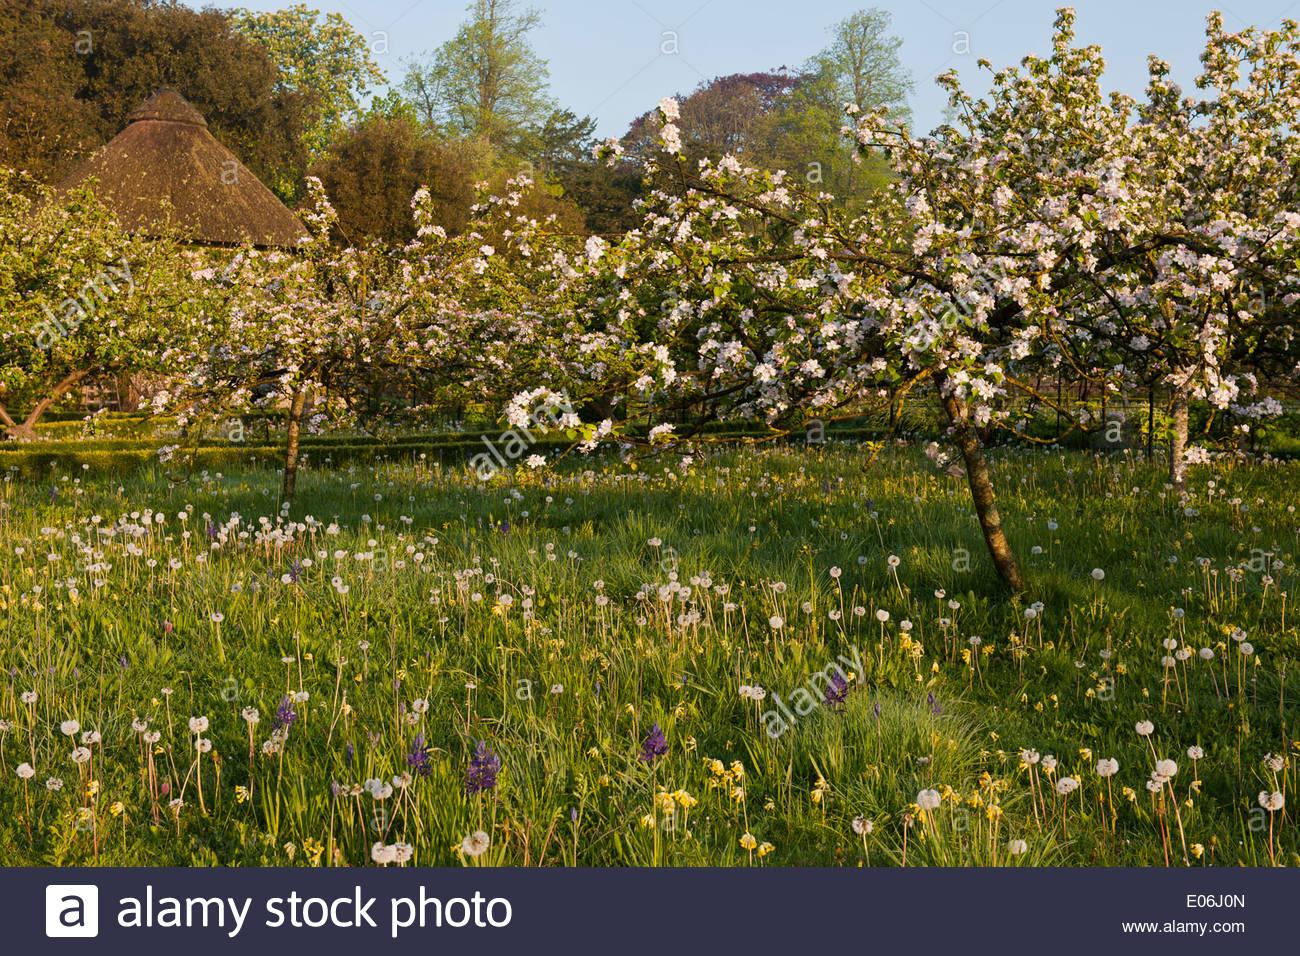 Apple Orchard underplanted Wiild Blumen Löwenzahn Schlüsselblumen Camassia Quamash Blüten Becher Obstbäume Blüten Frühlingsblumen Stockbild